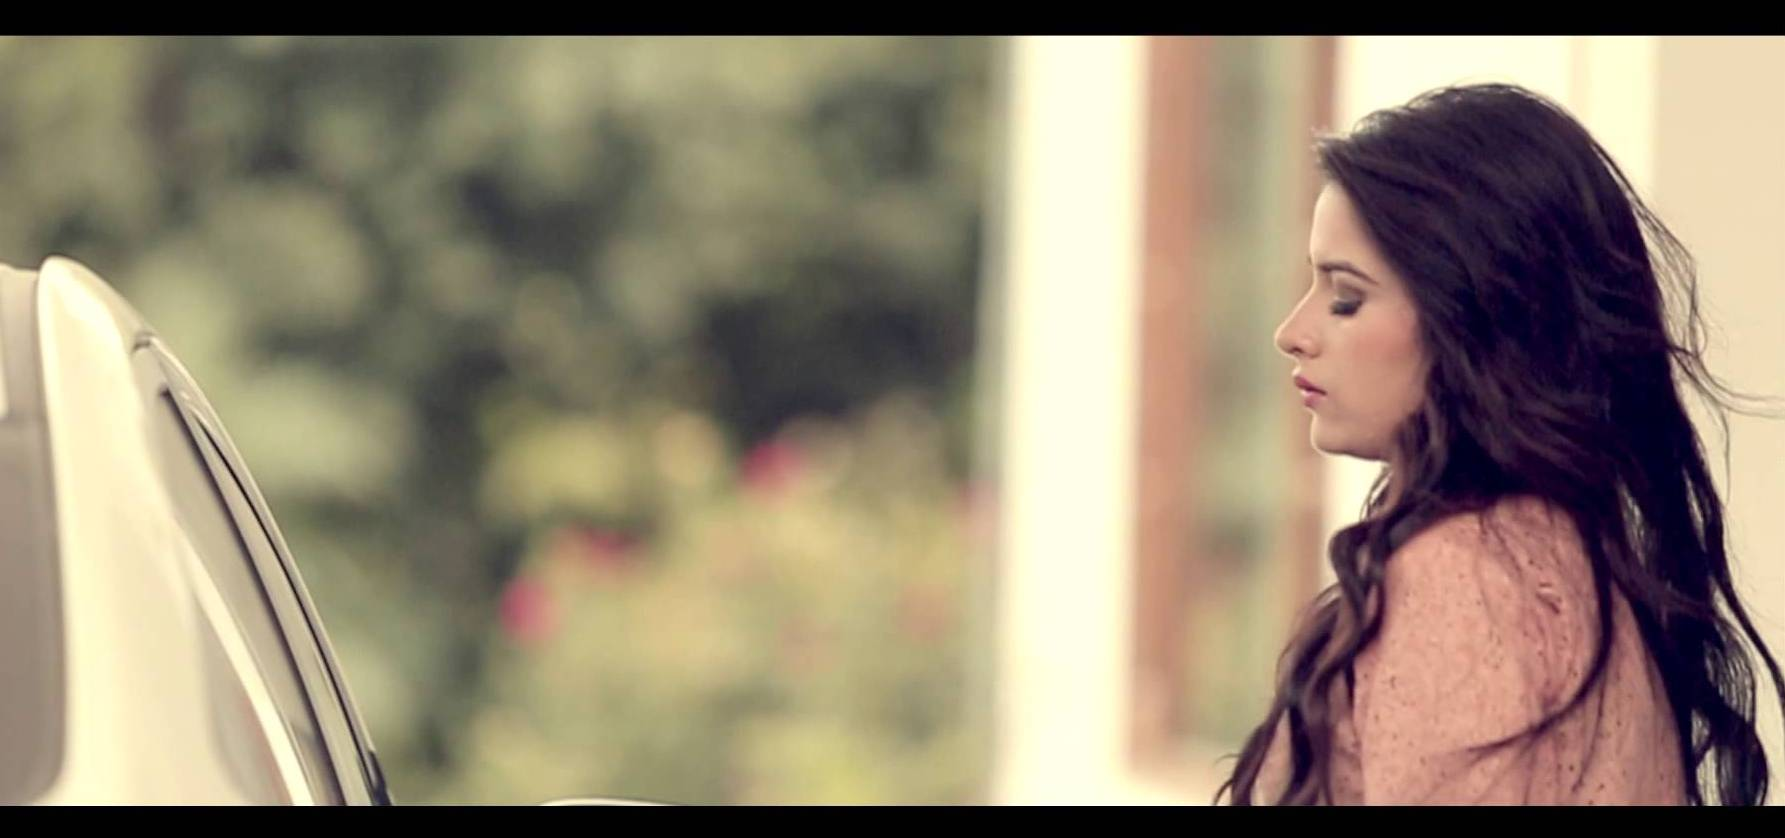 24 Hot & Cute Photos of Famous Punjabi Model Sara Gurpal